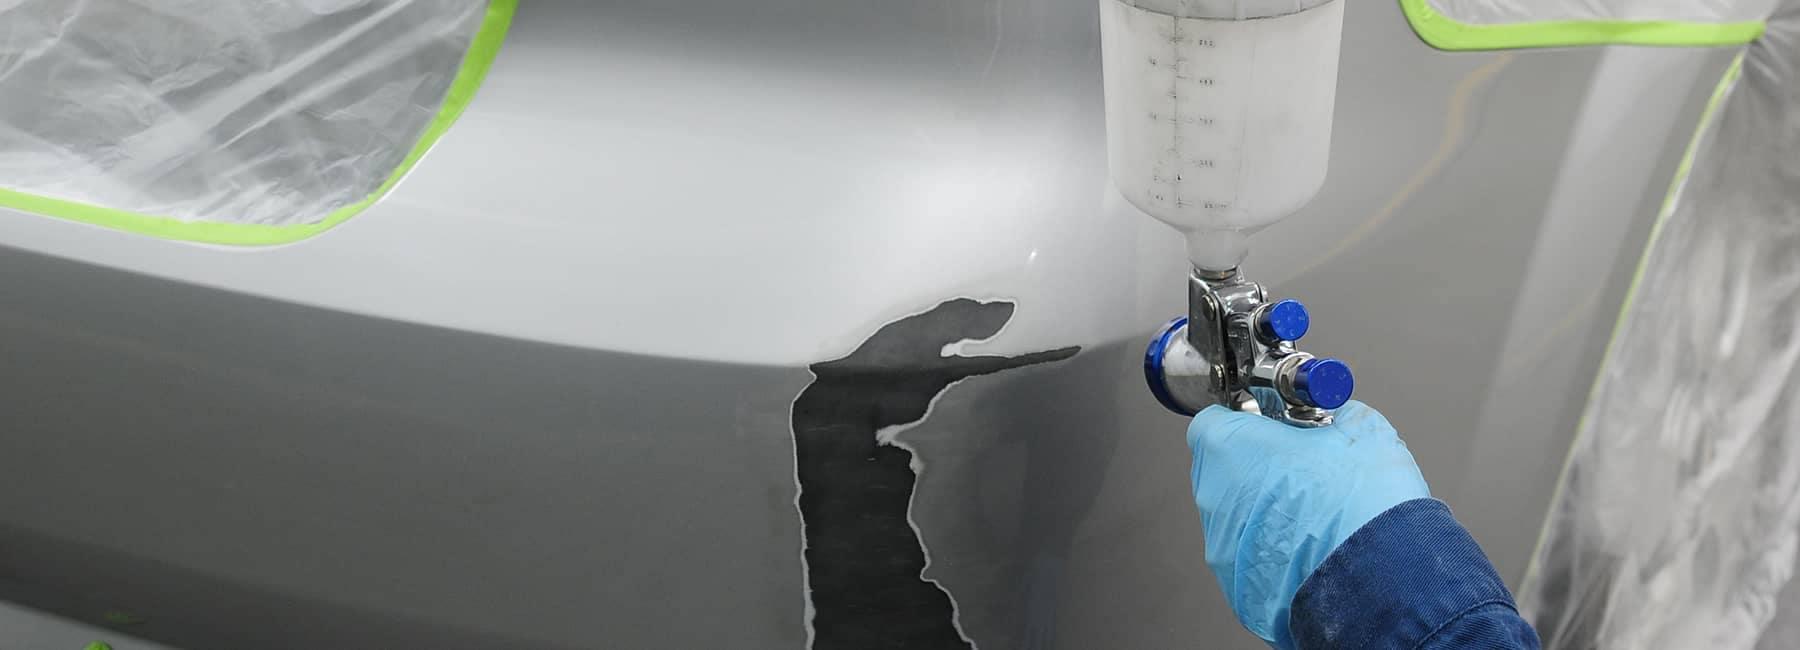 Mechanic painting car